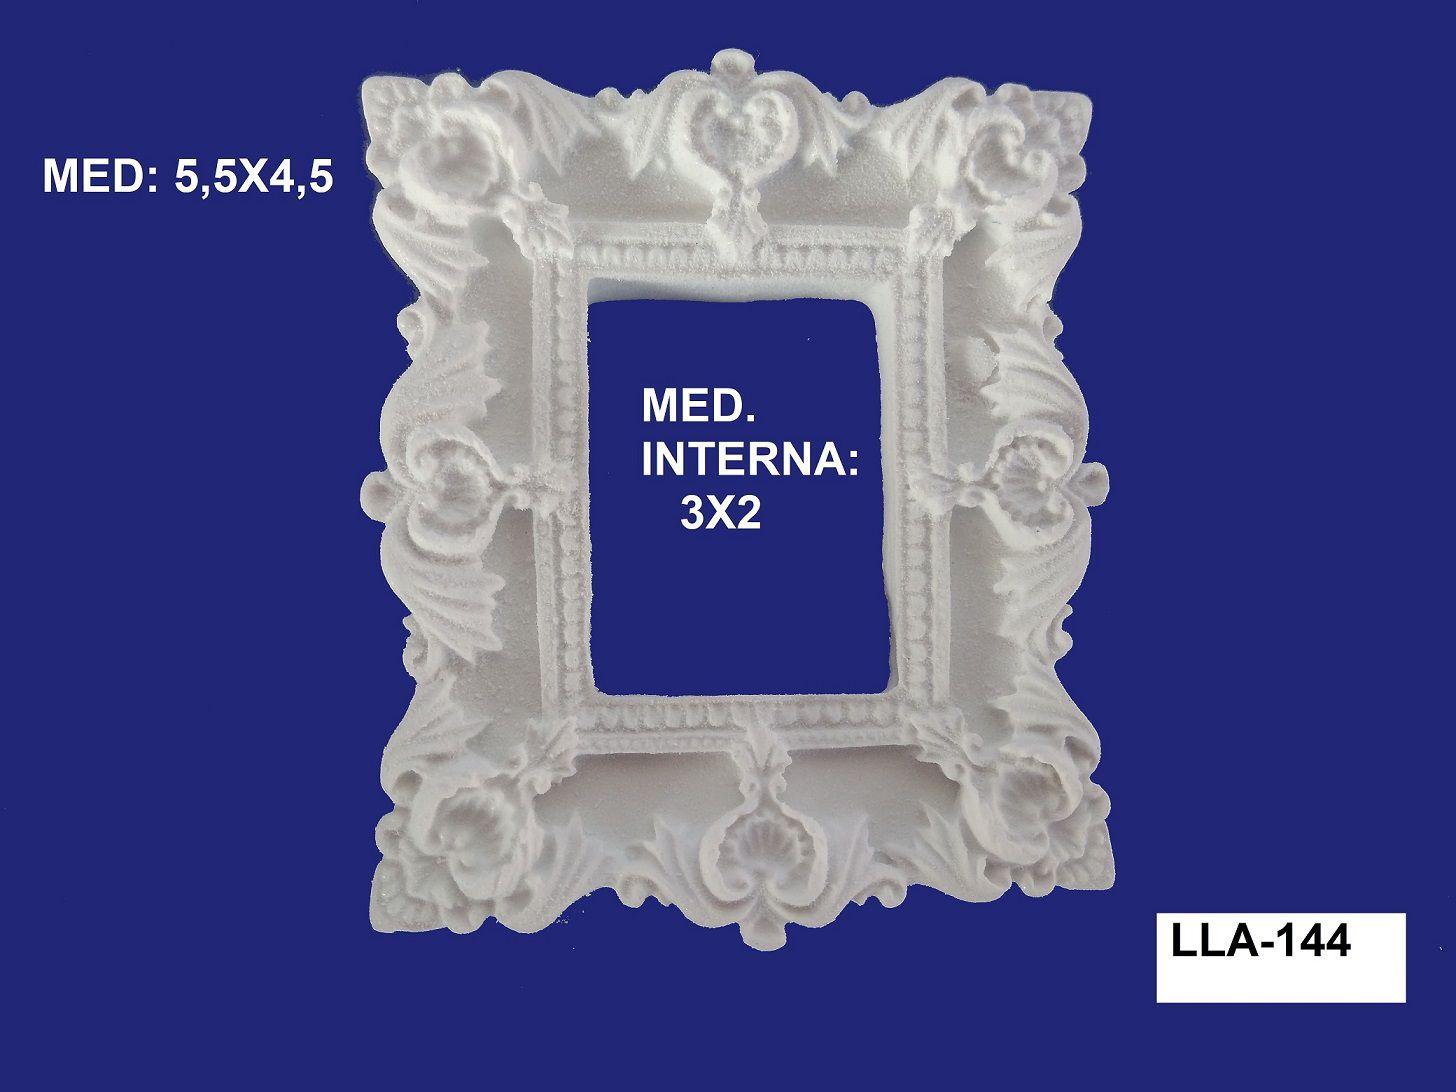 LLA-144 MOLDURA 5,5X4,5 INT: 03X02